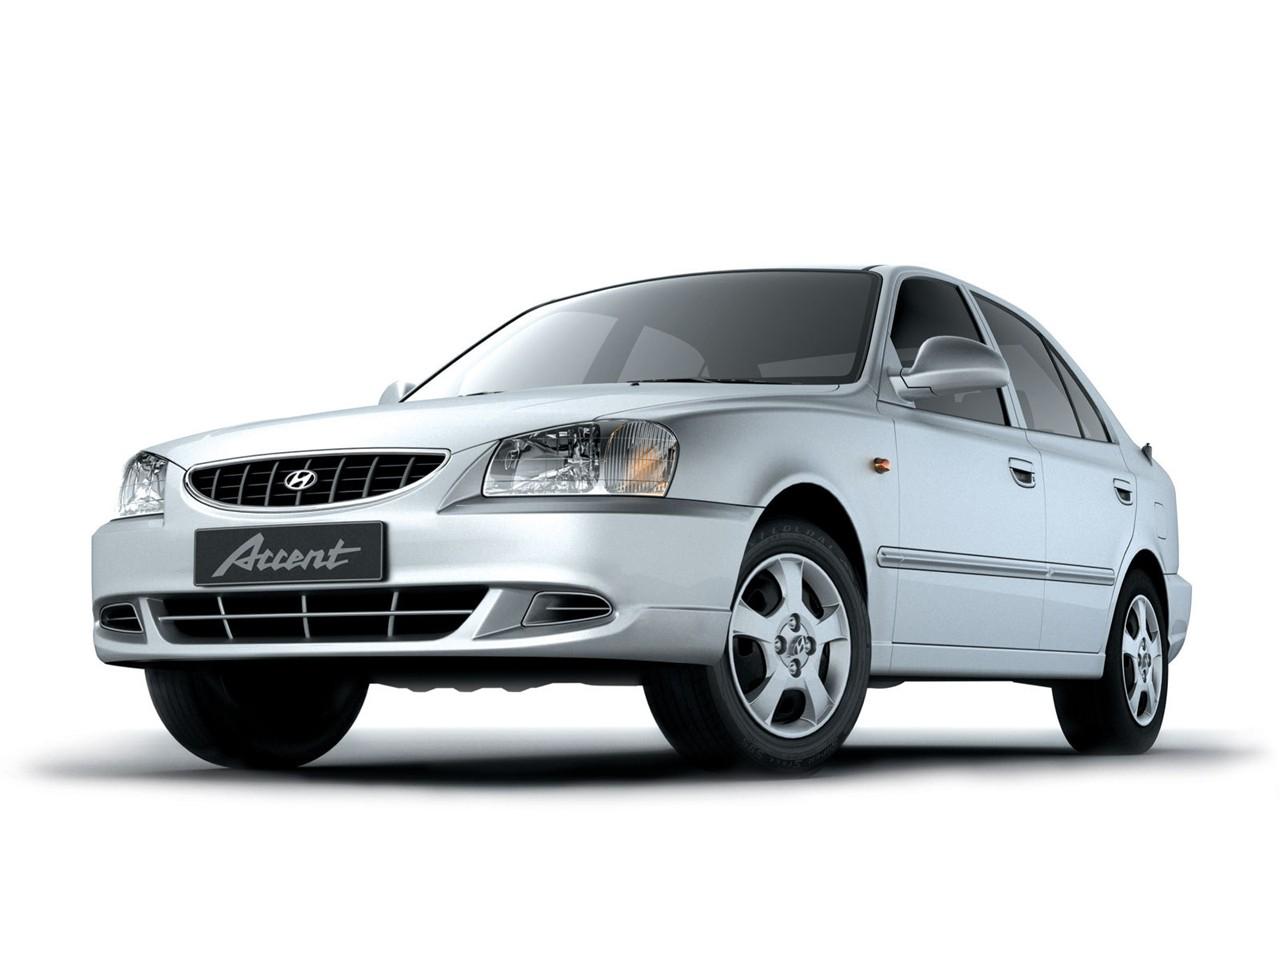 Hyundai Accent Doors on 2000 Hyundai Accent